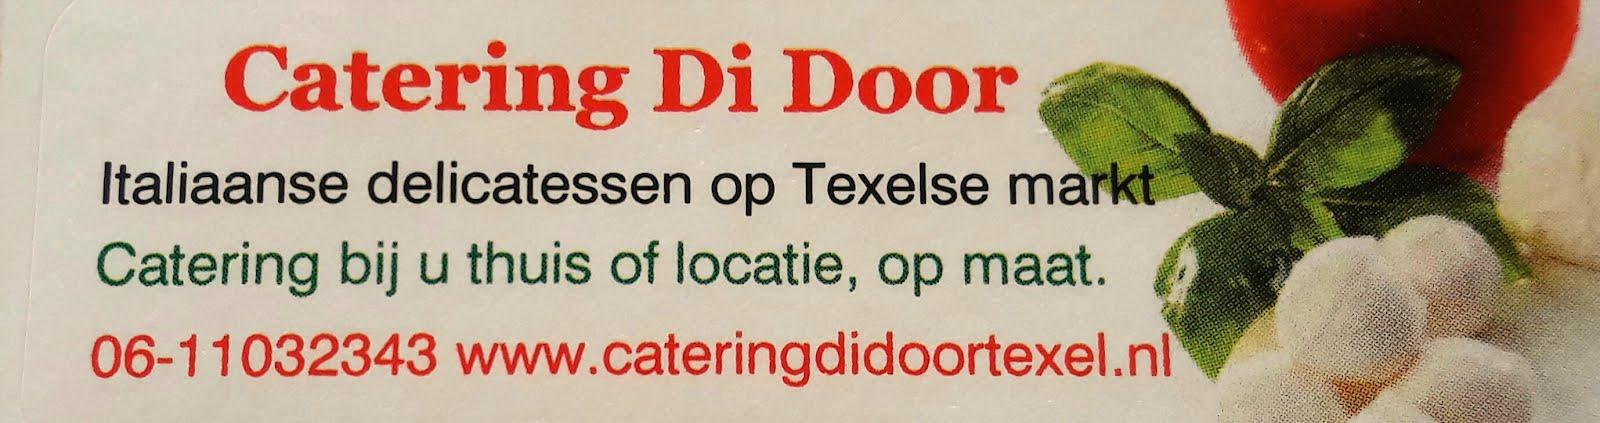 catering di door texel